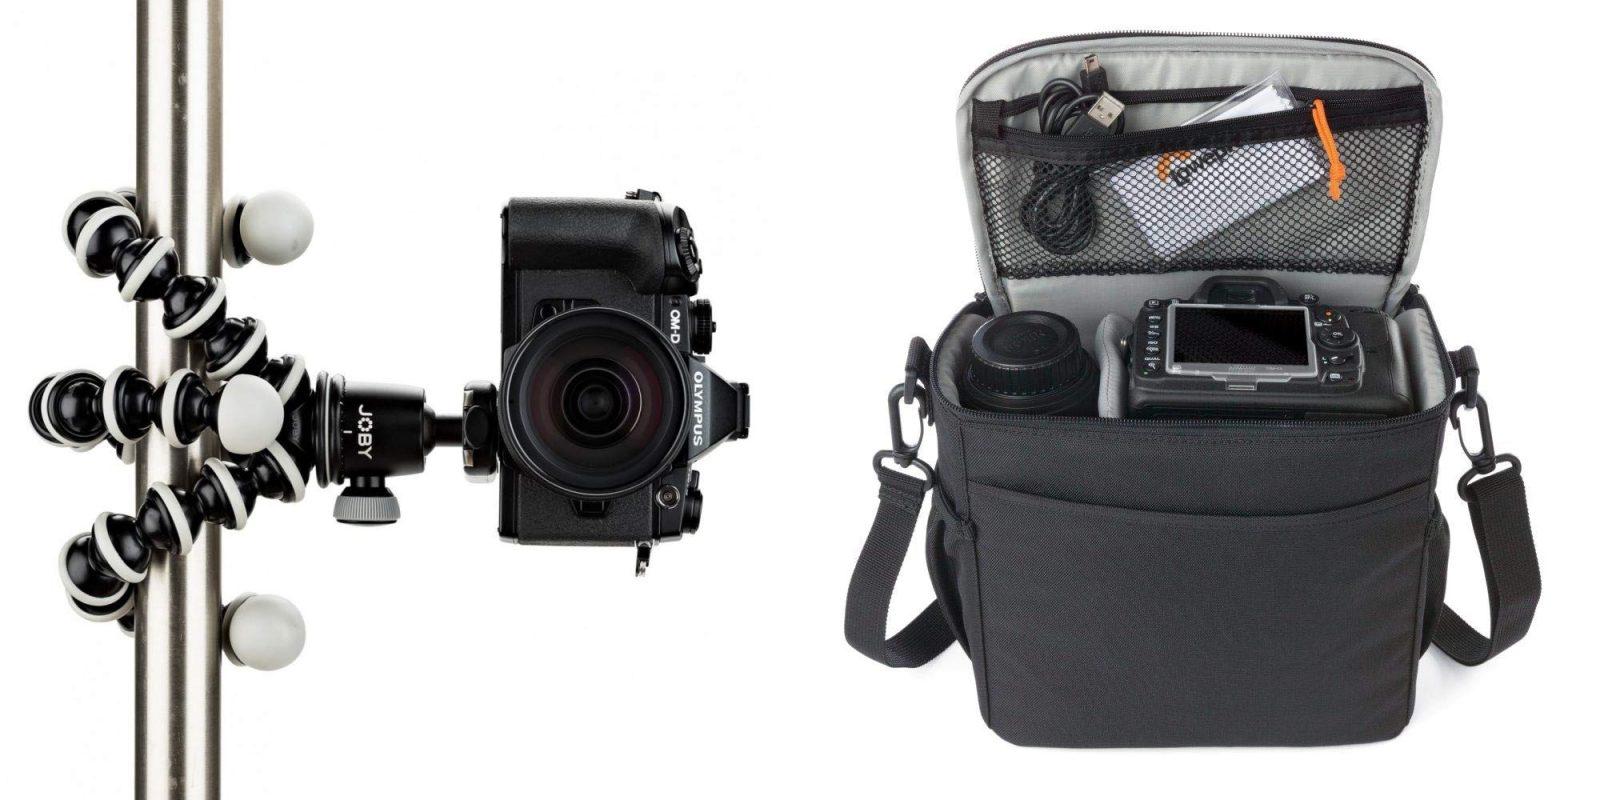 Bundle Lowepro's Camera Bag with the JOBY GorillaPod Tripod for $30 (Save 50%)